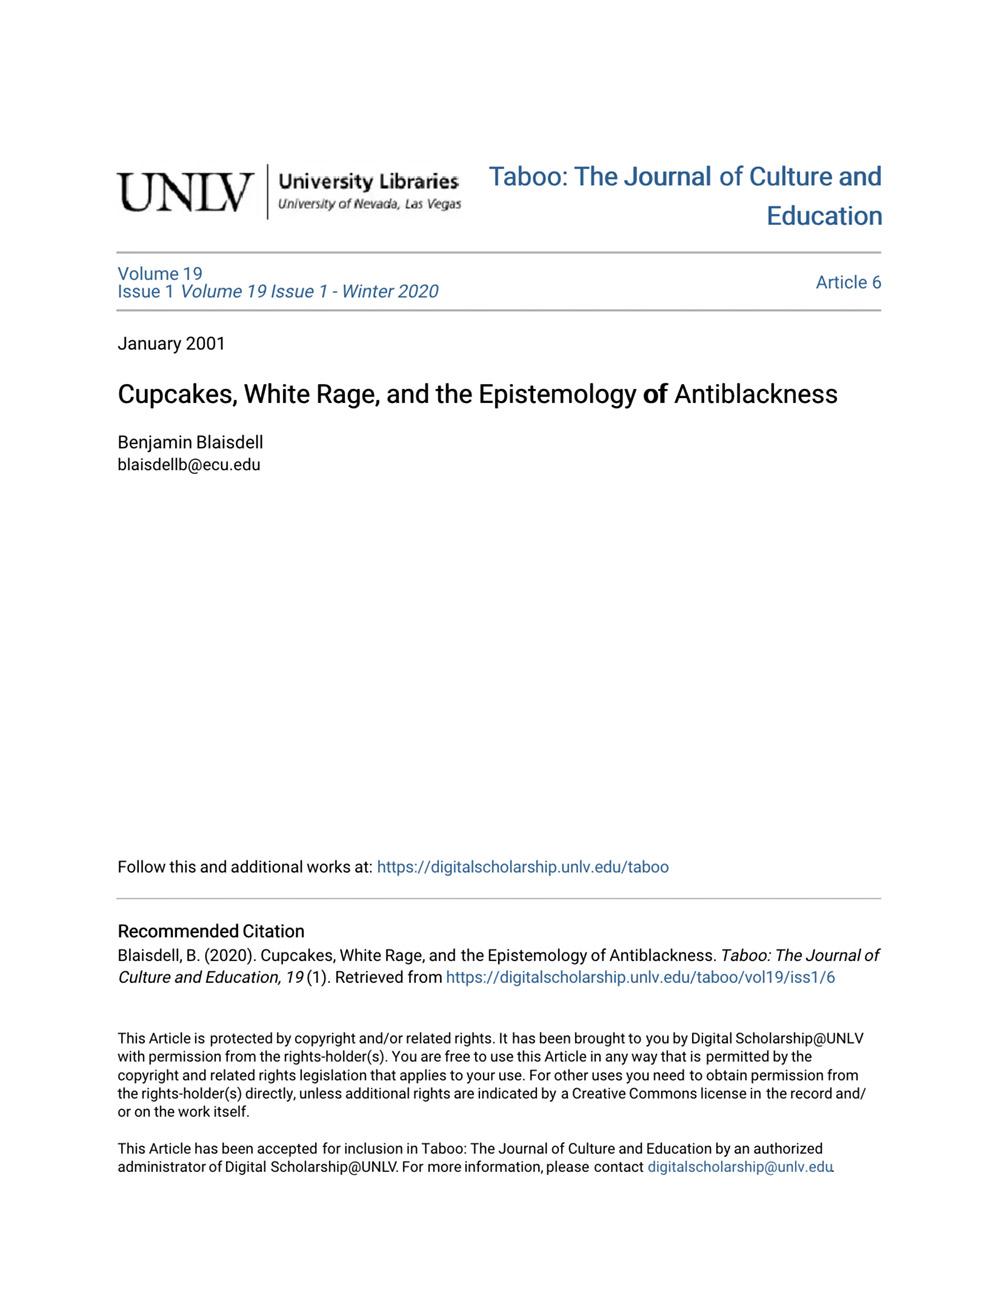 Cupcakes, White Rage, and the Epistemology of Antiblackness